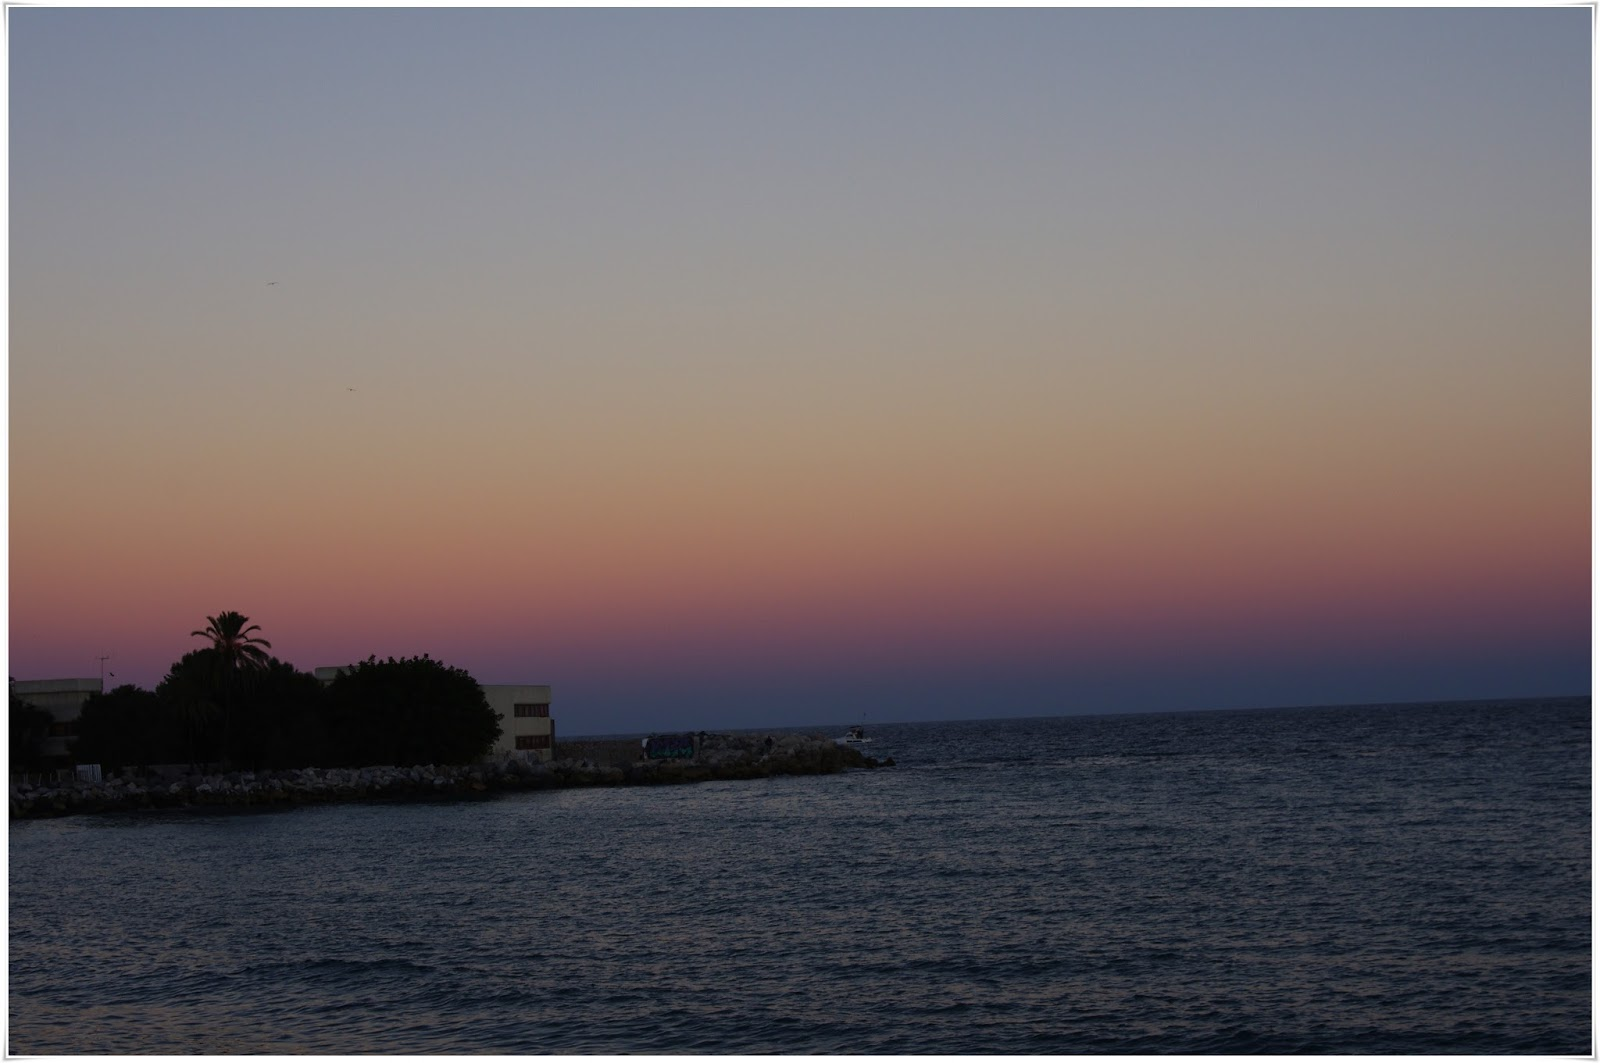 FUENGIOLA, plaża